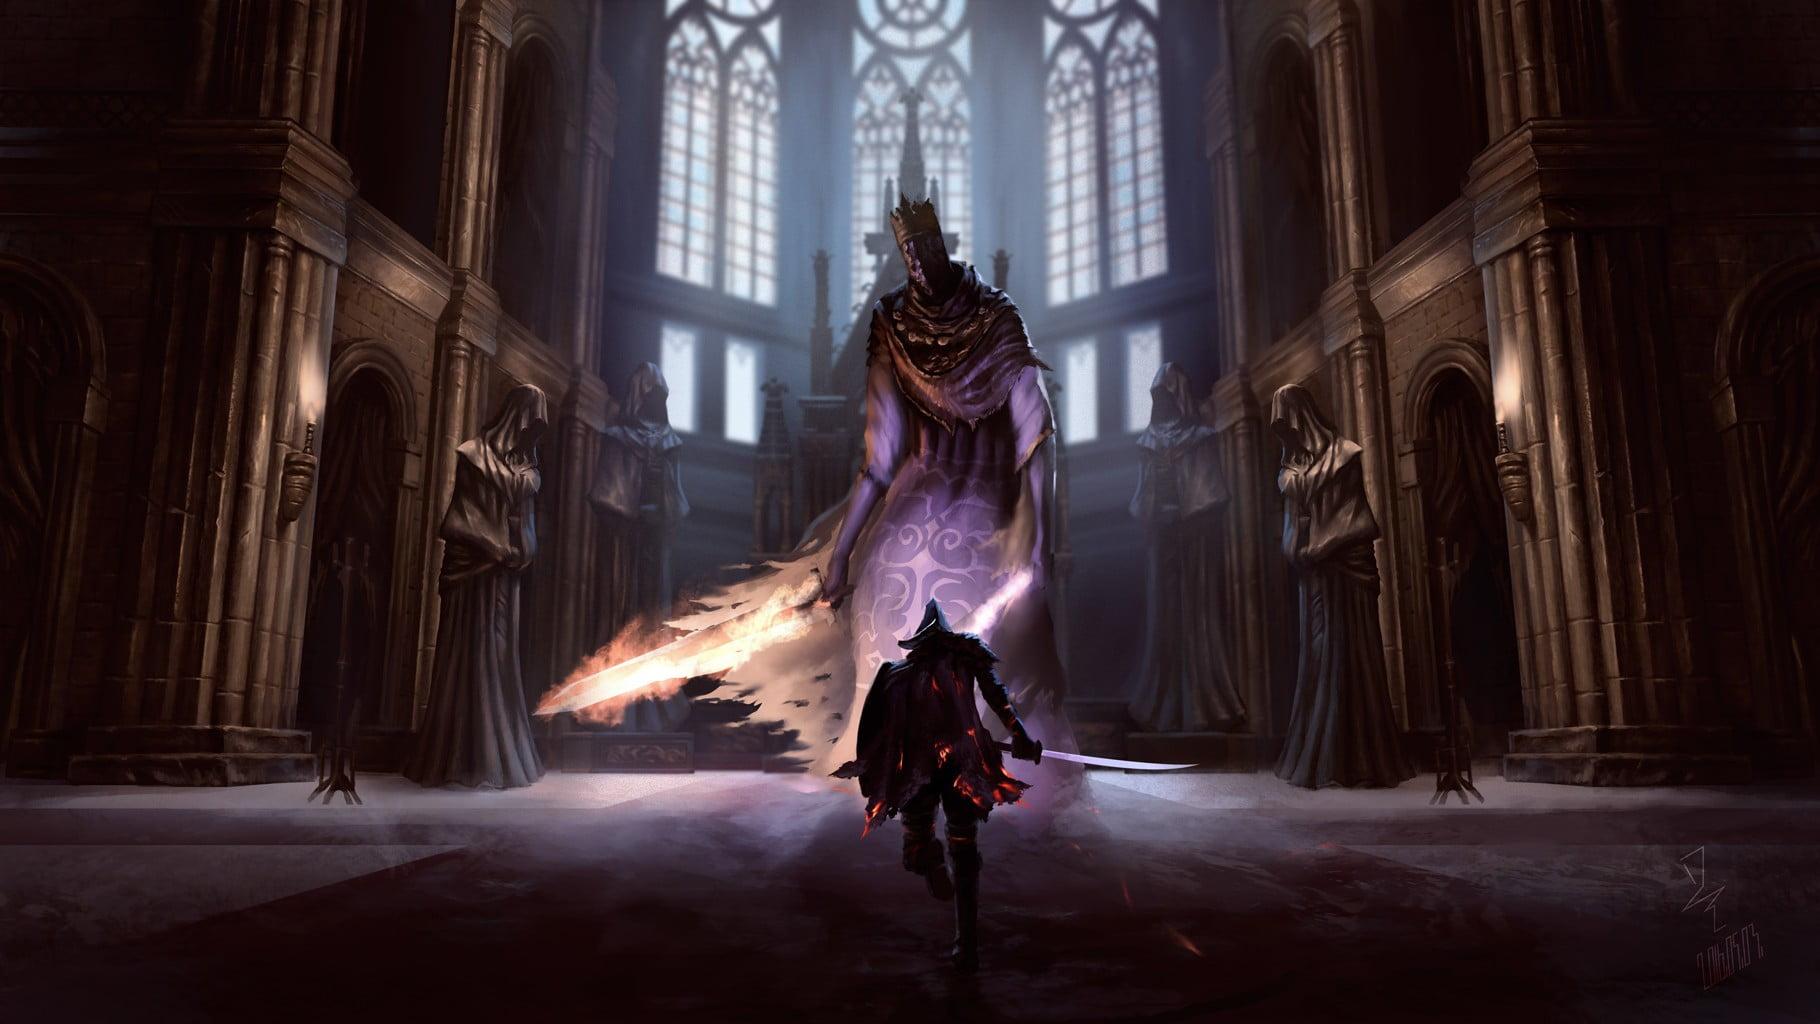 Farron Dark Souls 3 2261219 Hd Wallpaper Backgrounds Download